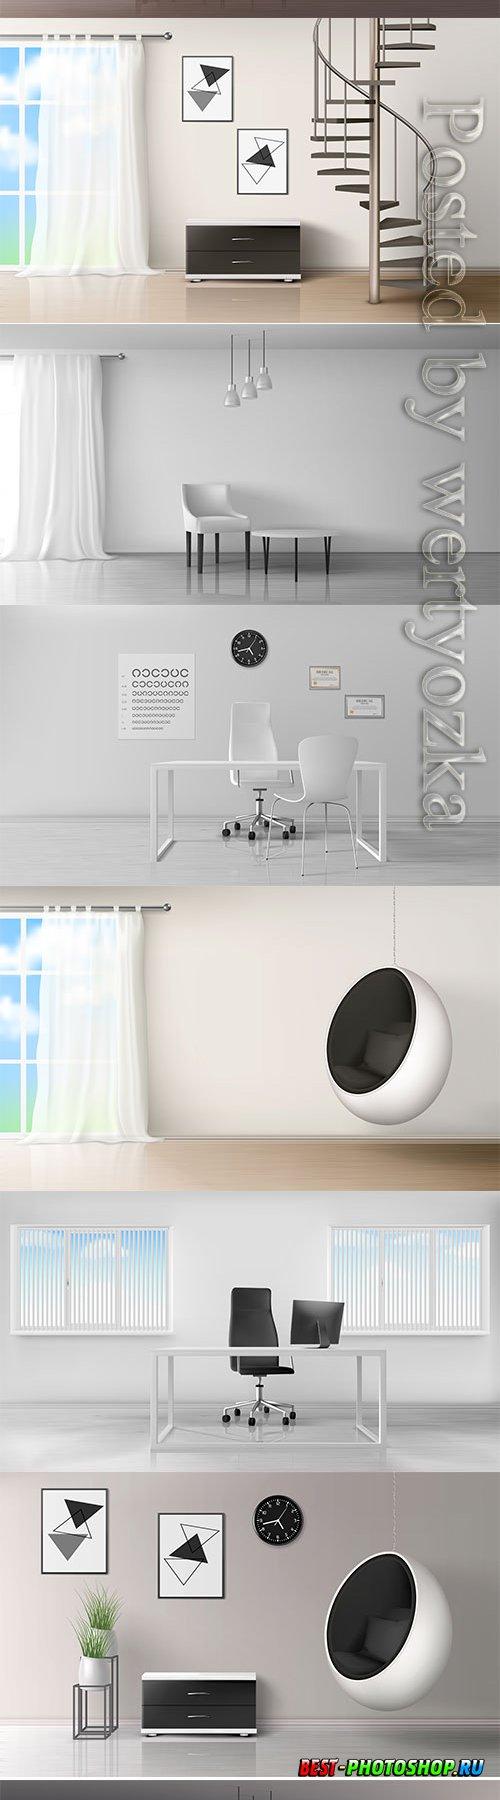 Modern interior in vector